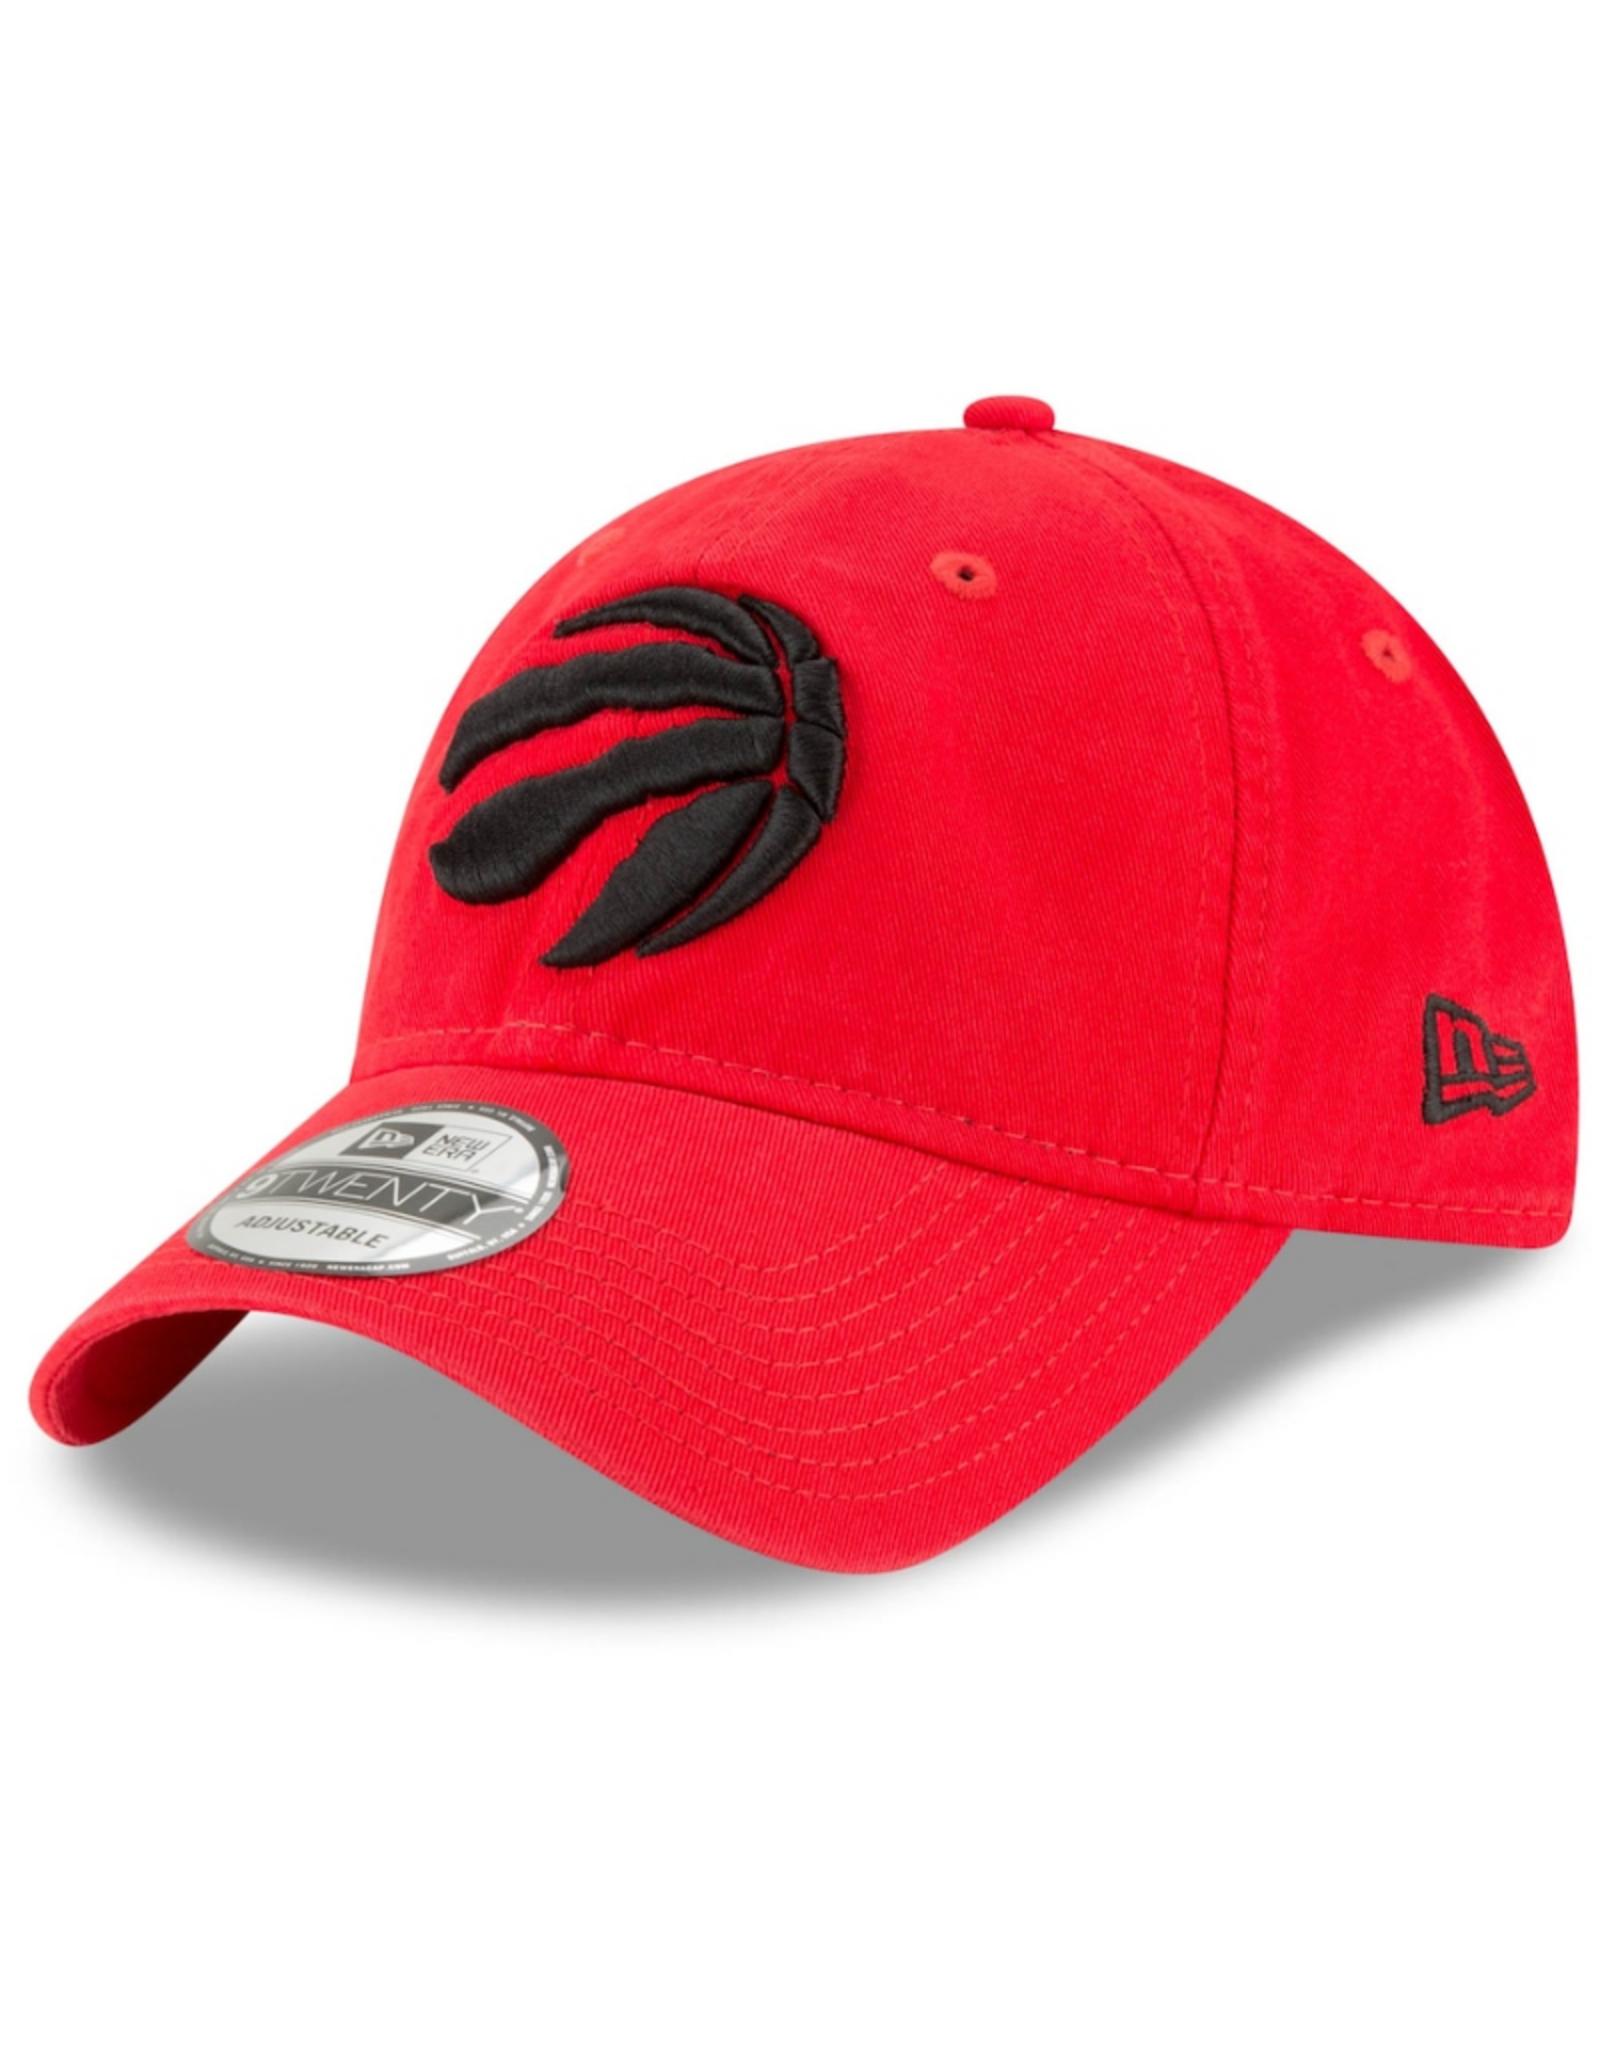 New Era Men's Core Classic 2 Adustable Hat Toronto Raptors Red